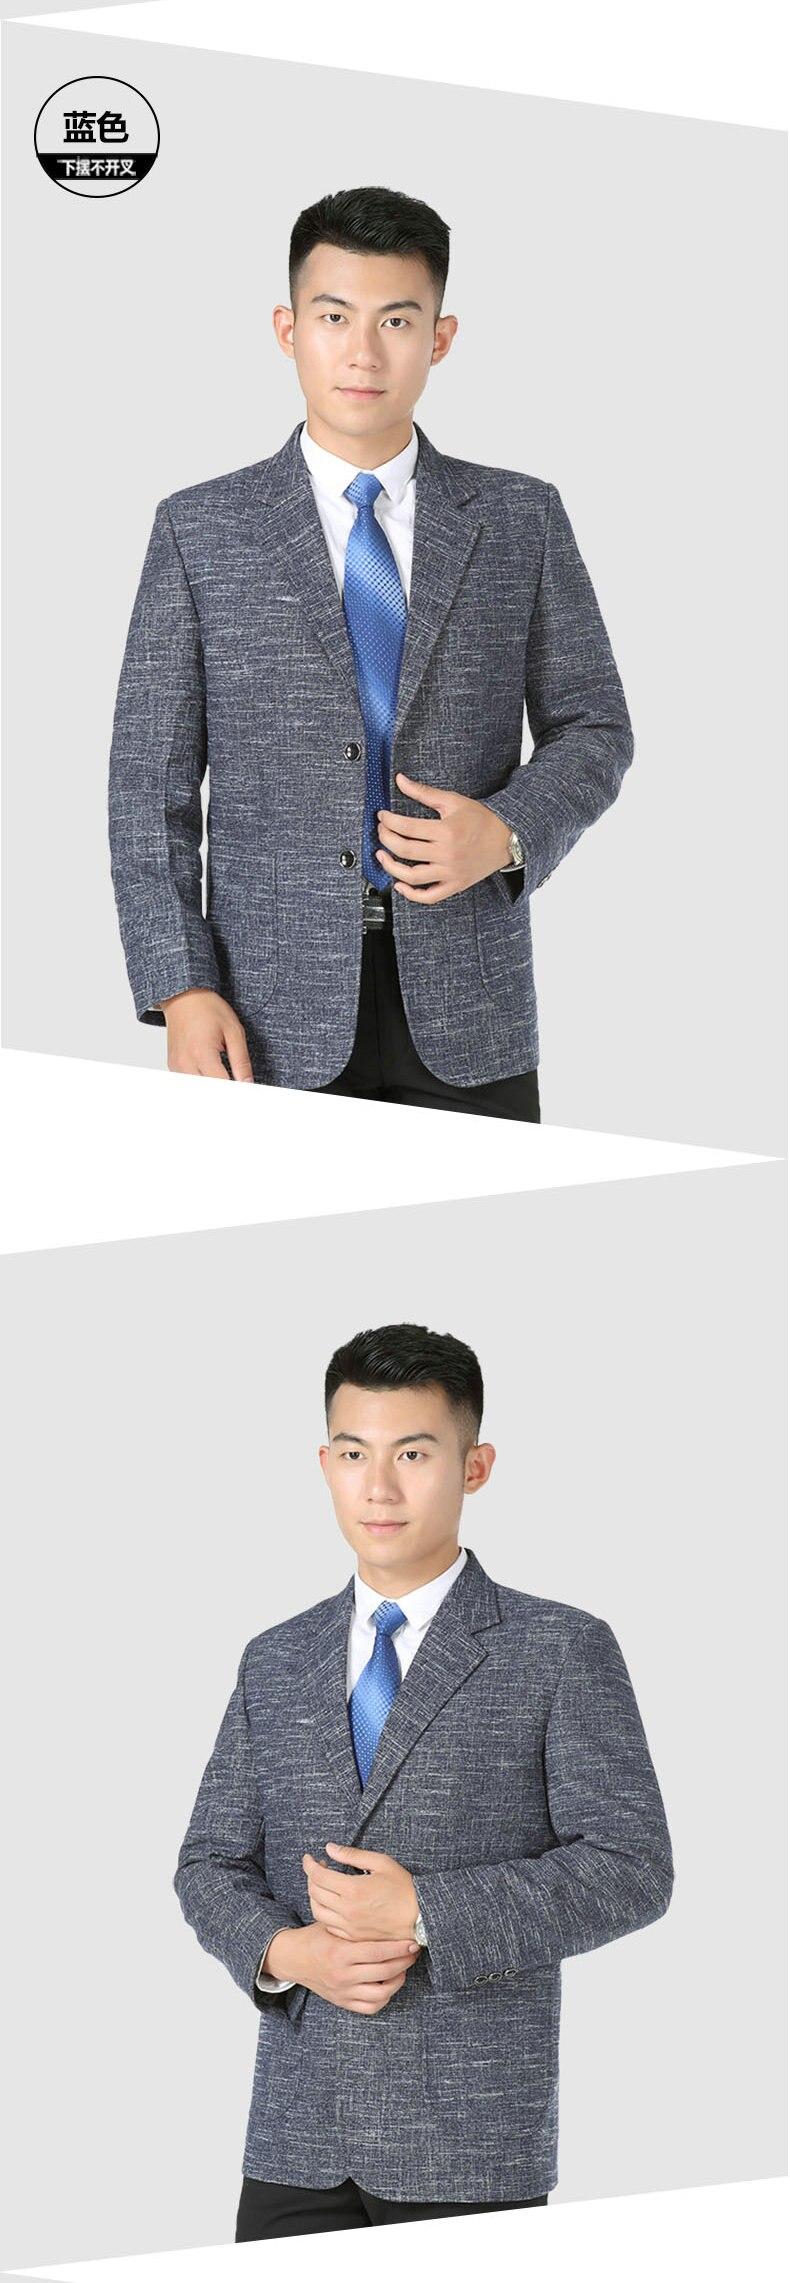 WAEOLSA Men Elegance Blazers Gray Red Khaki Suit Jackets Man Notched Collar Outfits Business Casual Blazer Male Office Suit Jacket Plus Size Wear (5)